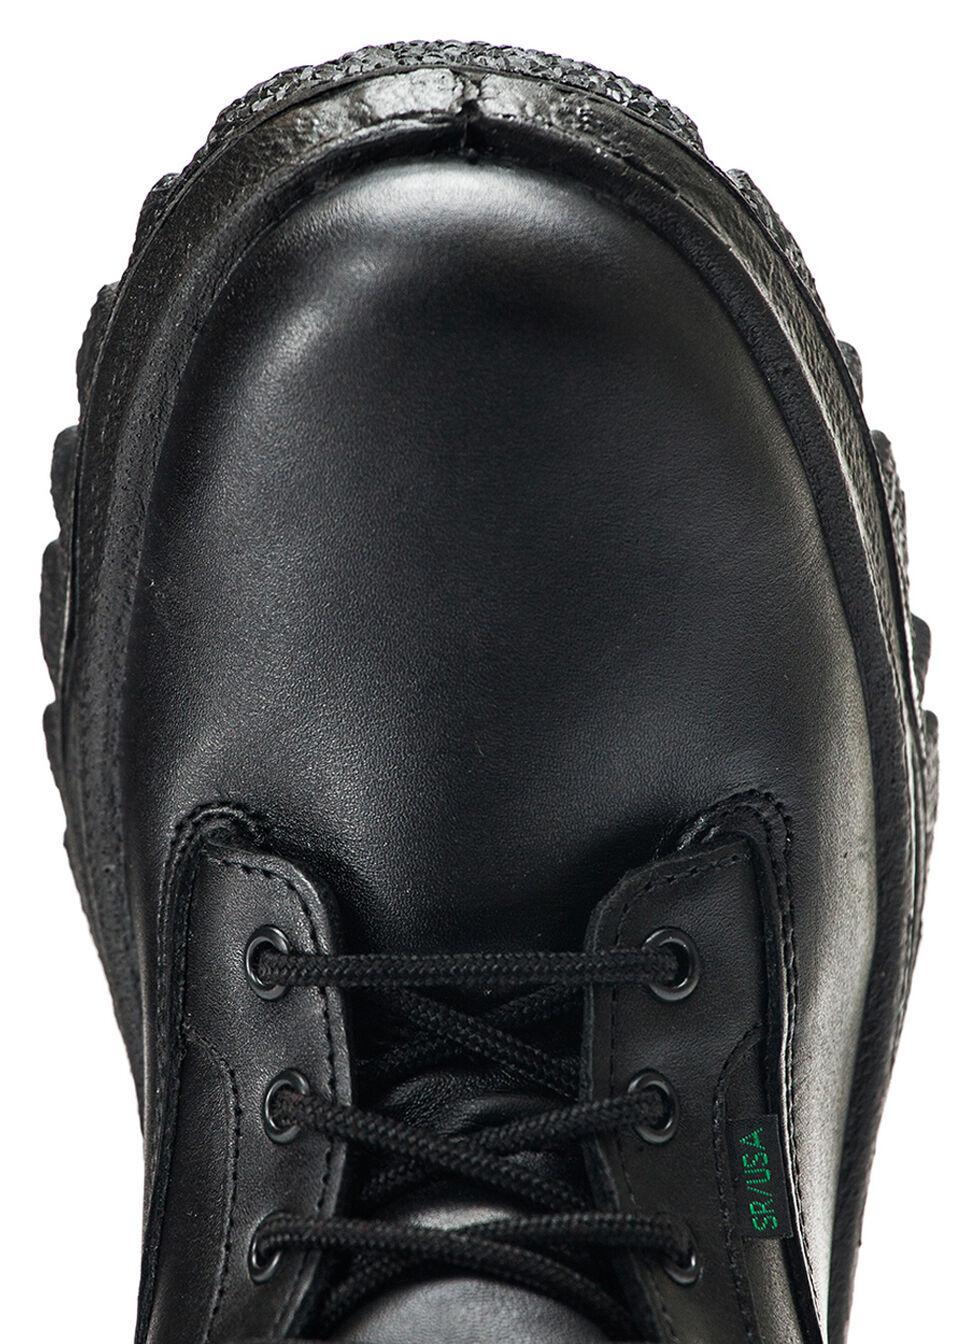 Rocky Men's TMC Duty Boots - USPS Approved, Black, hi-res